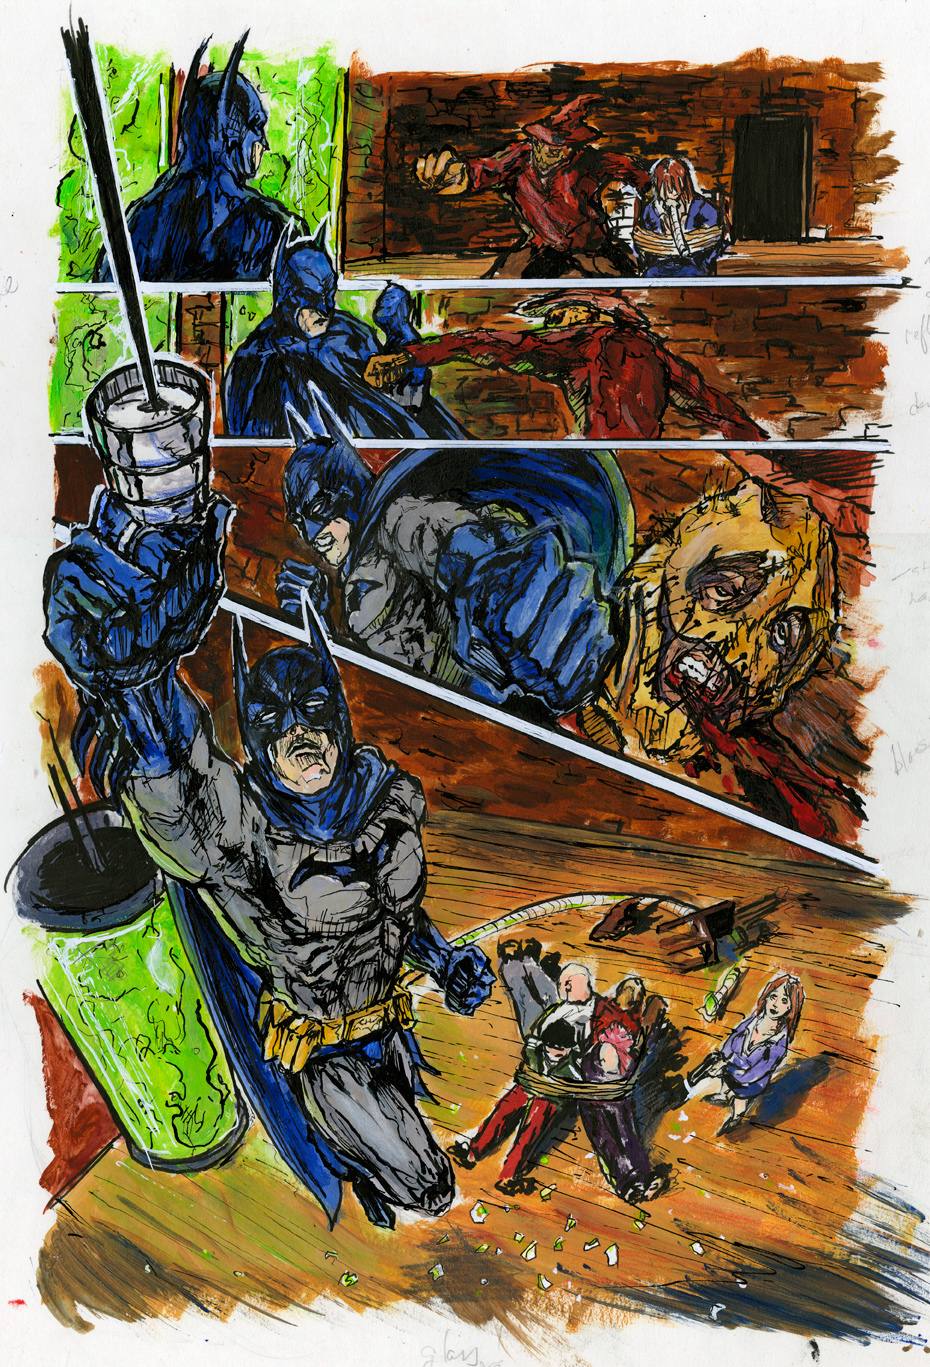 BatmanPortfolio4.jpg